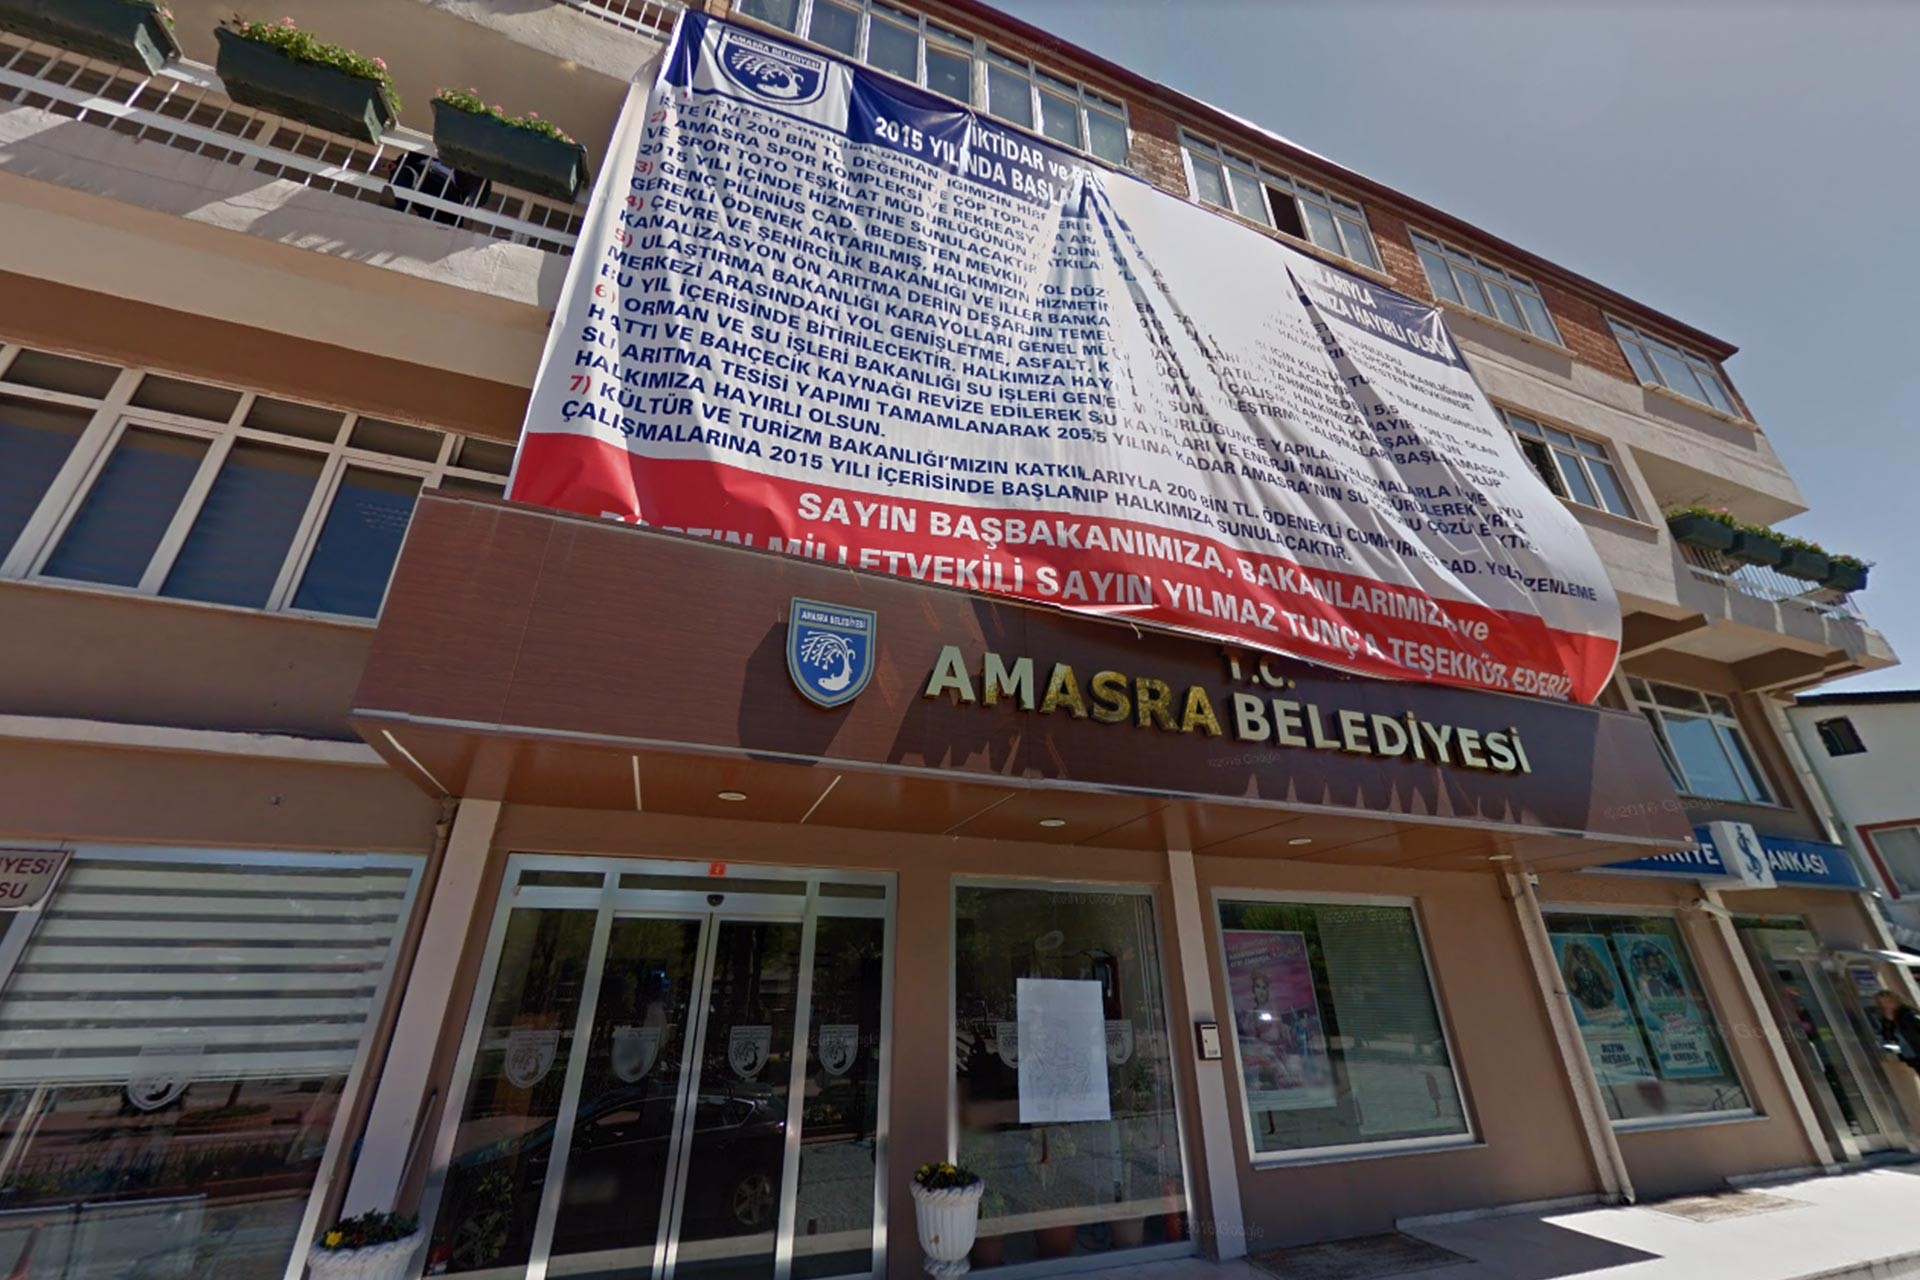 Amasra Belediyesi